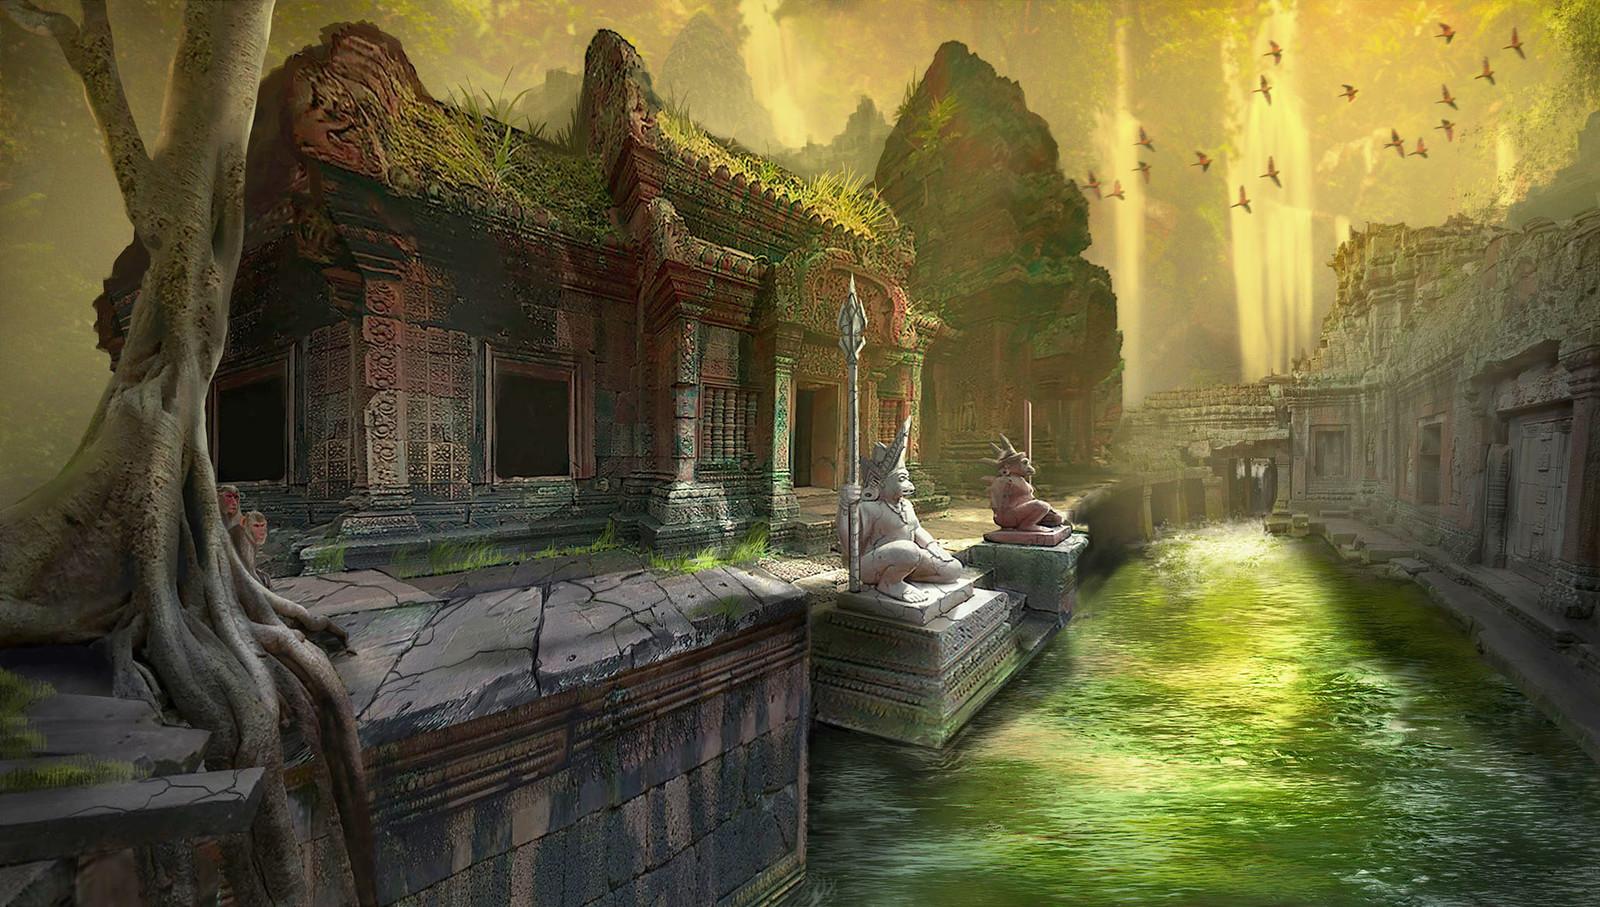 Monkey temple ruins